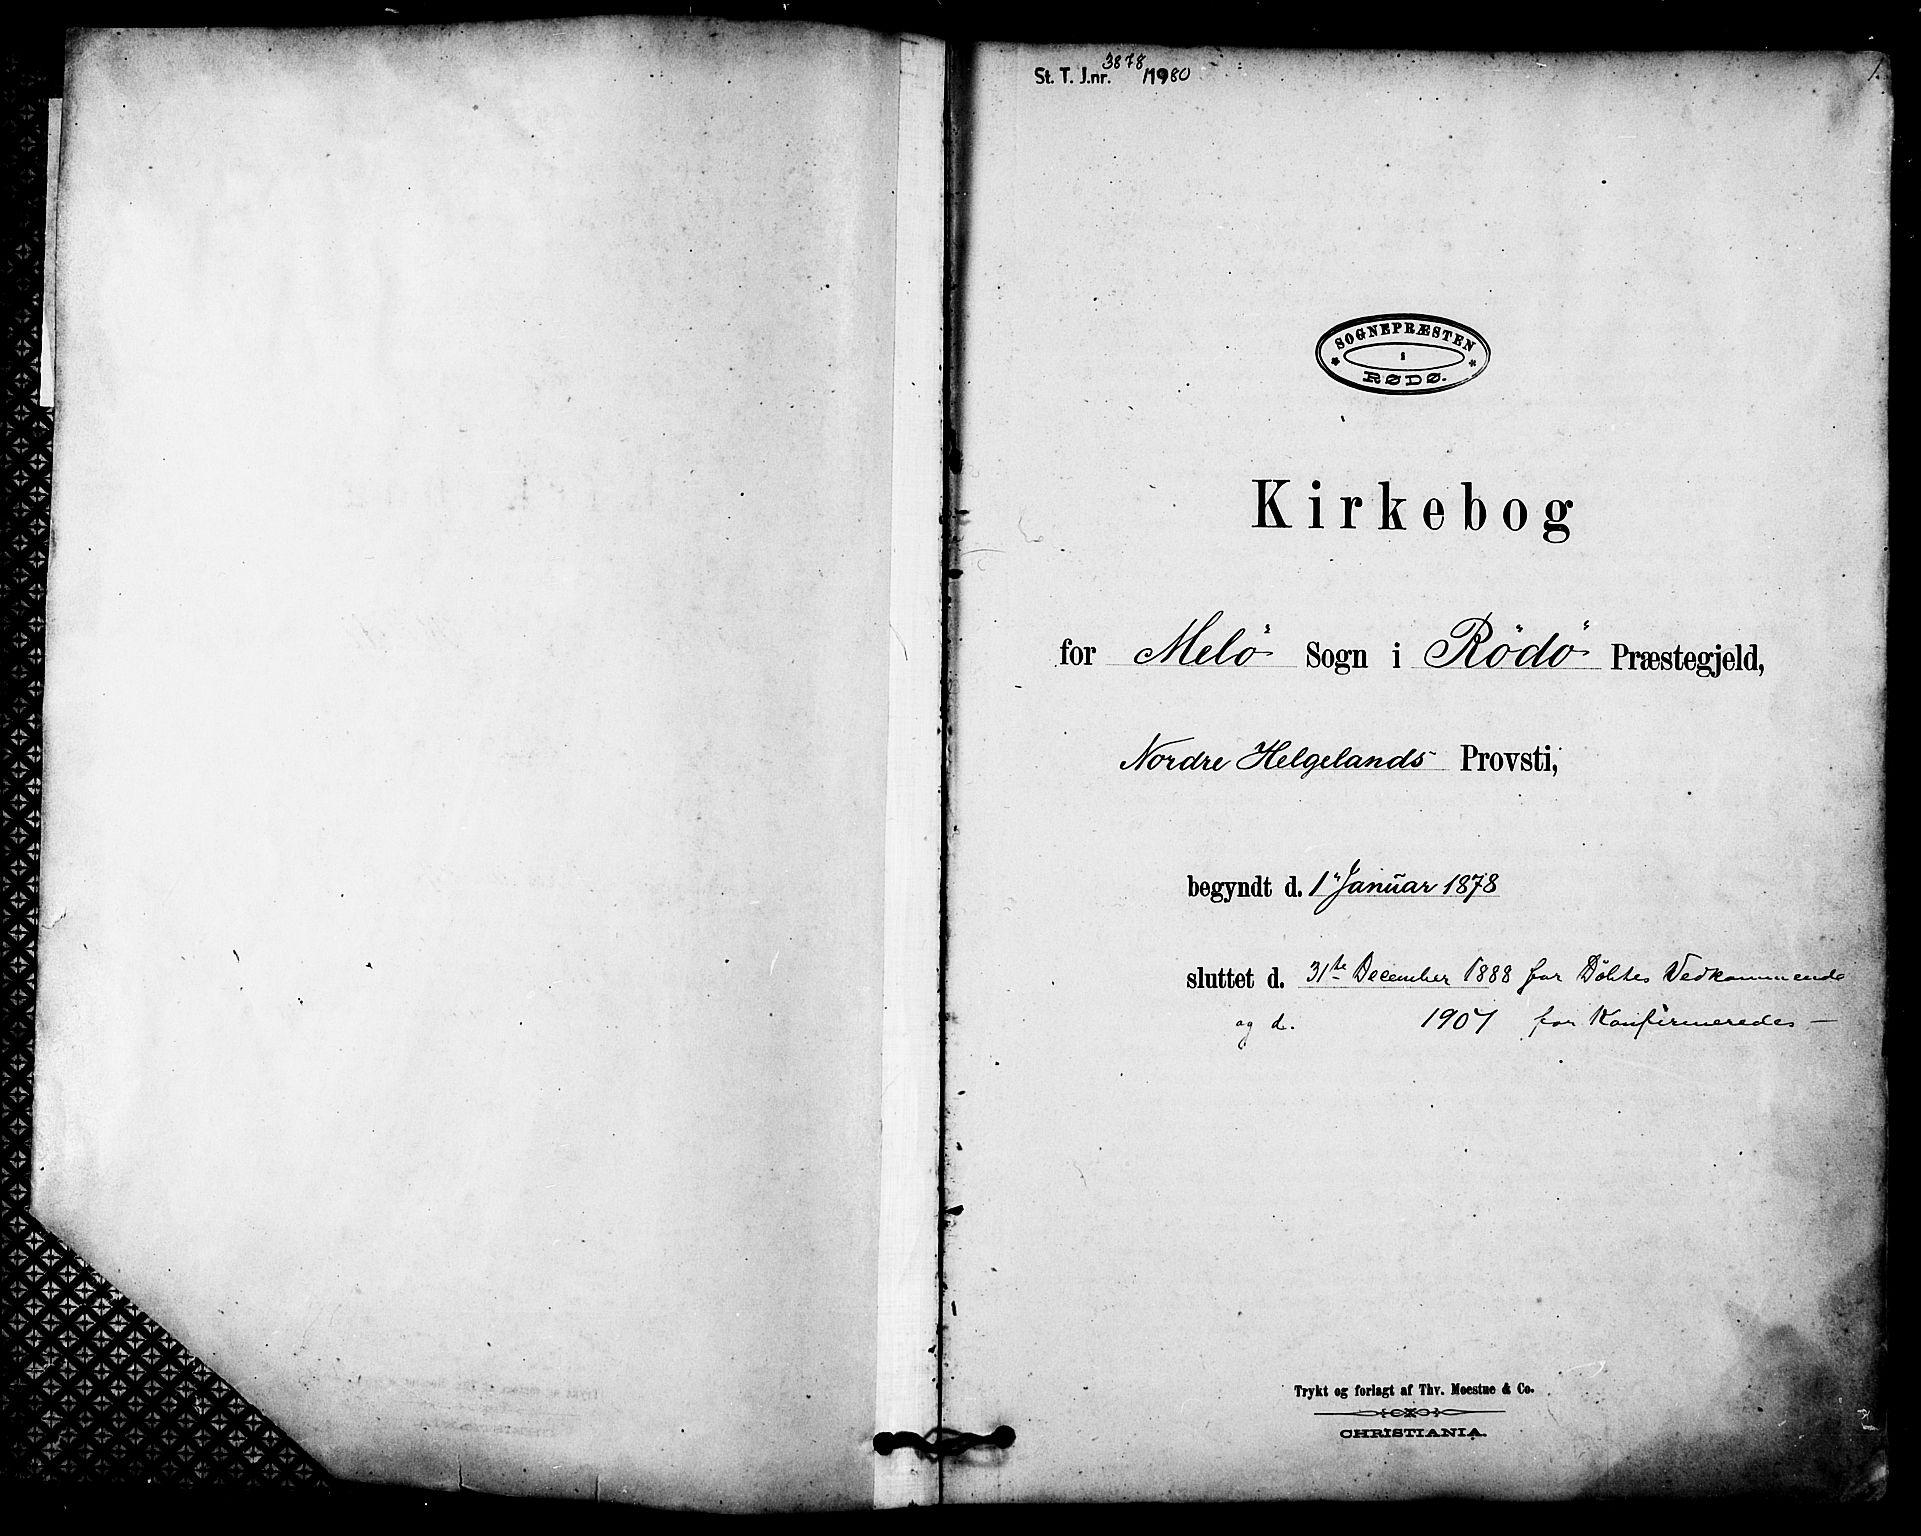 SAT, Ministerialprotokoller, klokkerbøker og fødselsregistre - Nordland, 843/L0626: Ministerialbok nr. 843A01, 1878-1907, s. 1